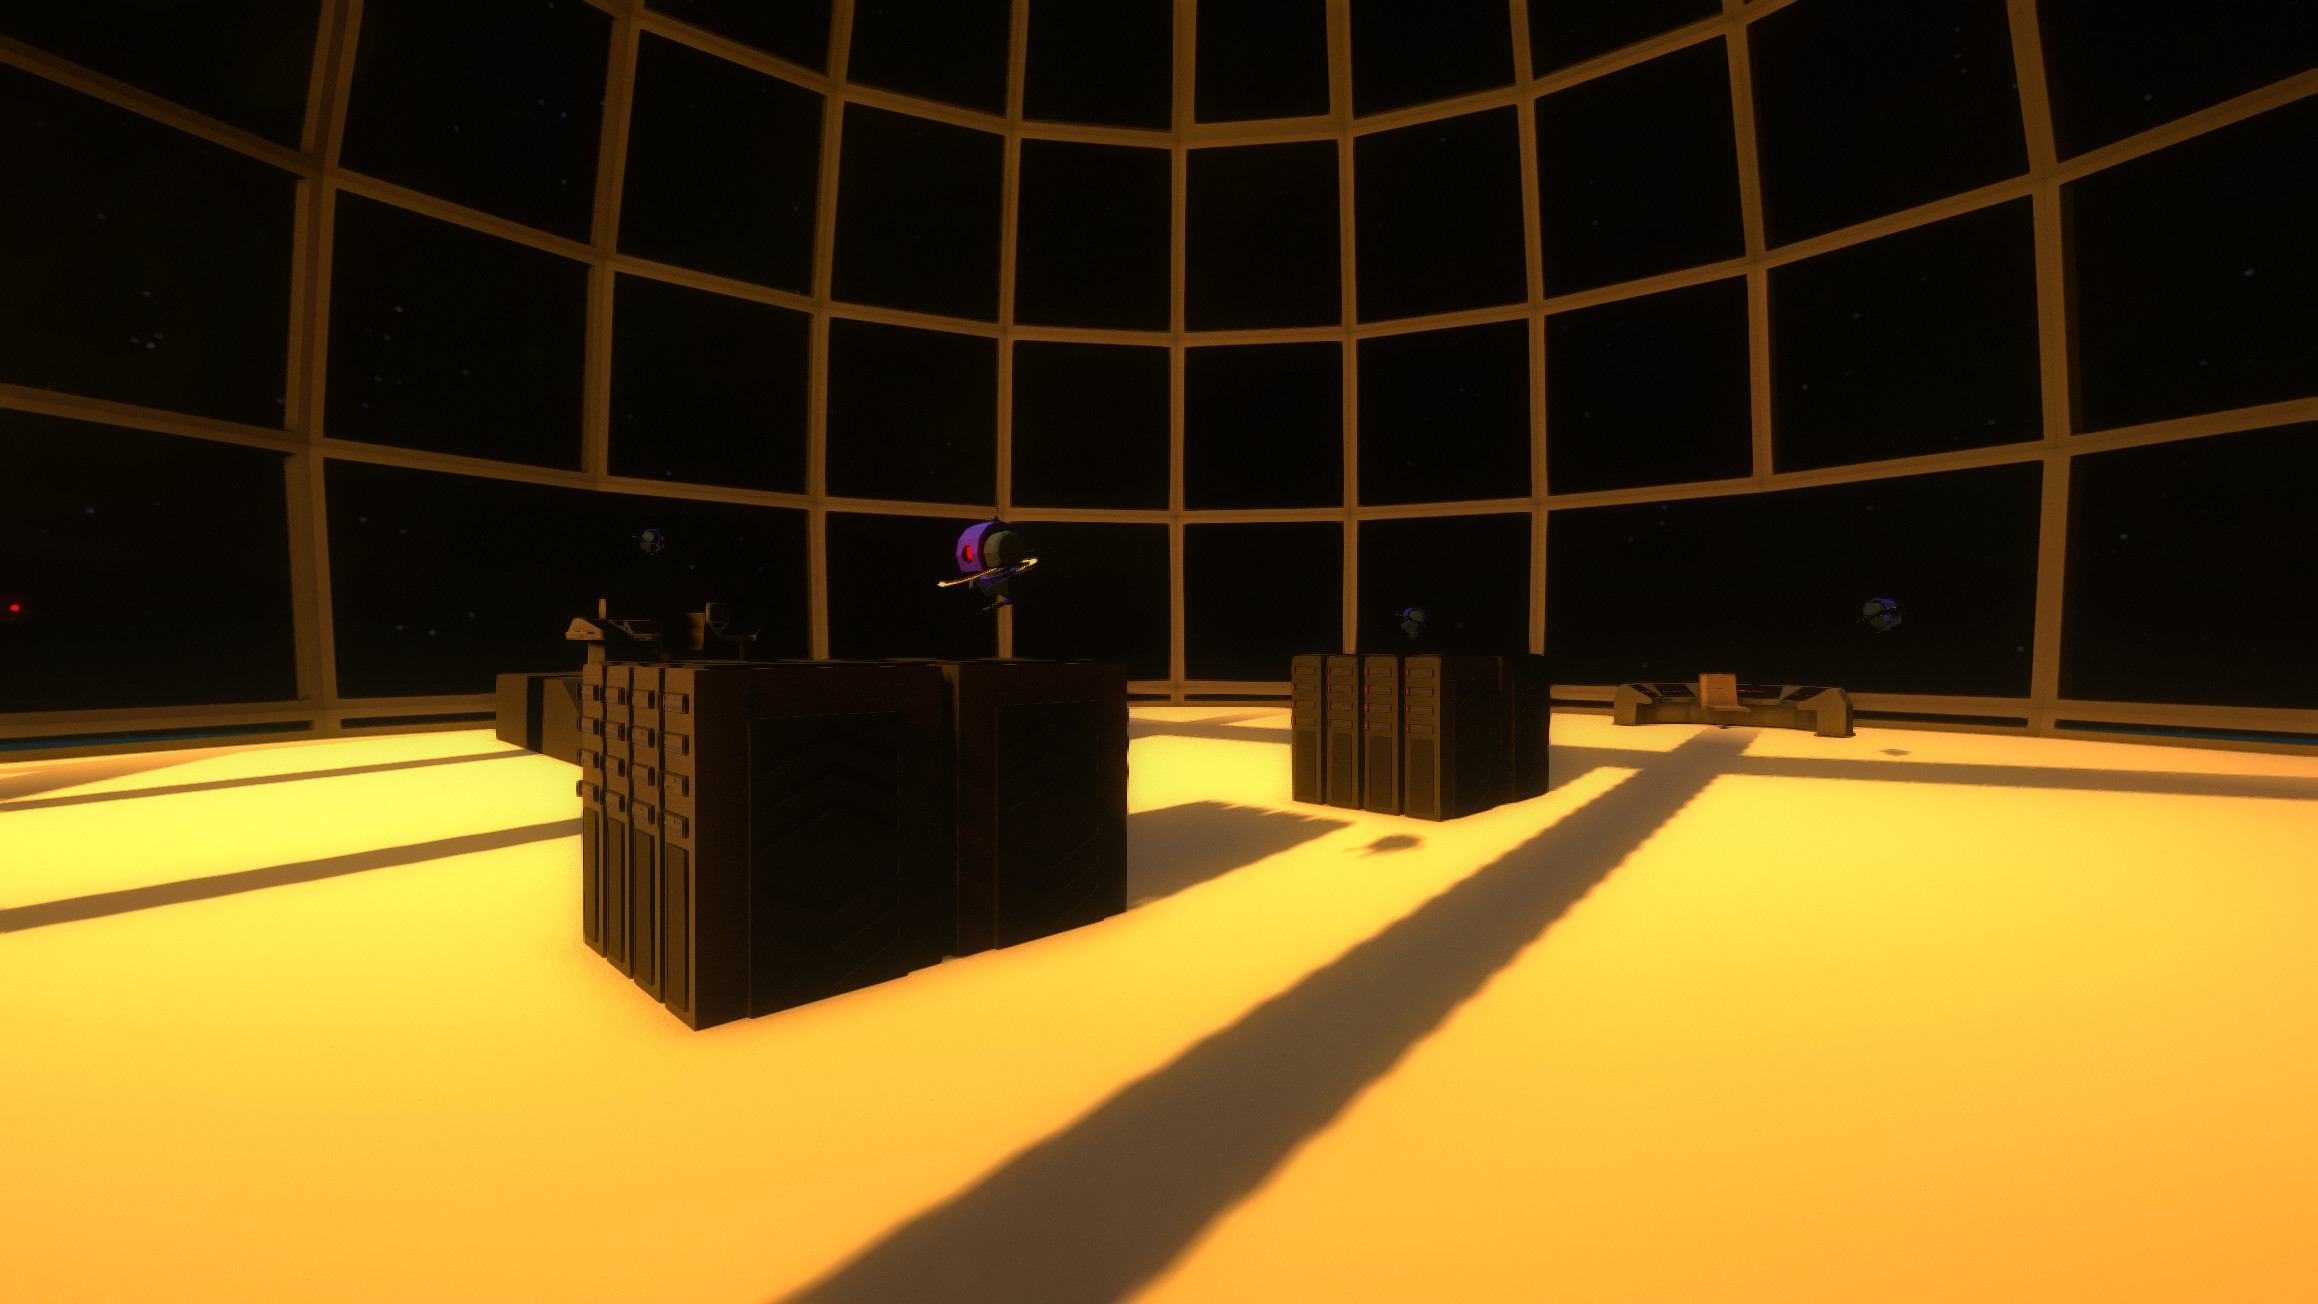 Spirits of Xanadu screenshot